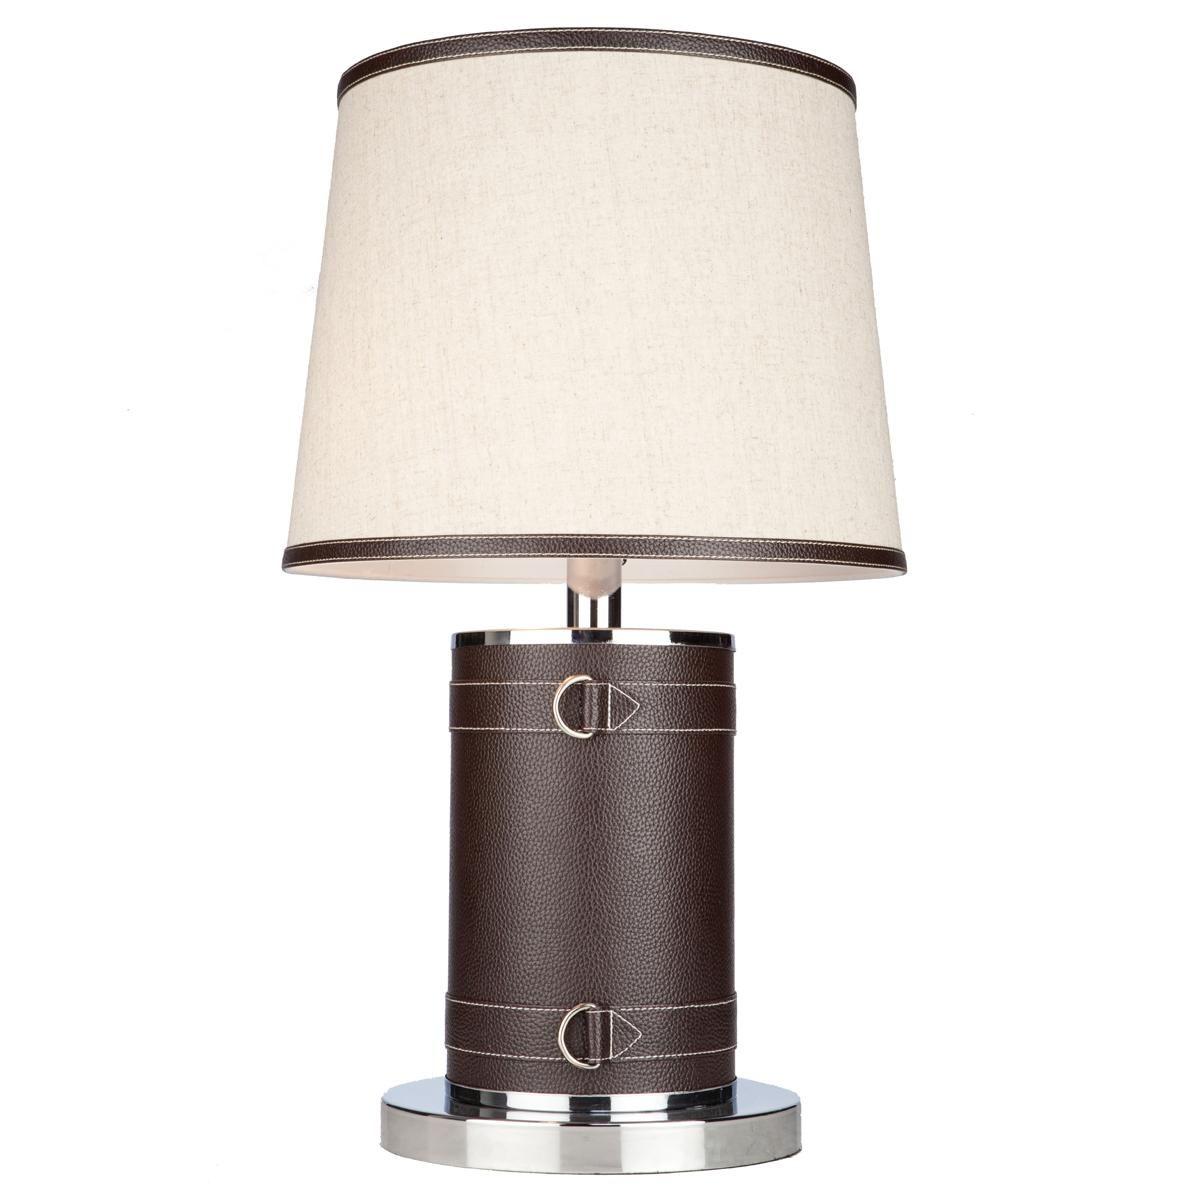 Leather u buckle jockey table lamp lighting pinterest glass